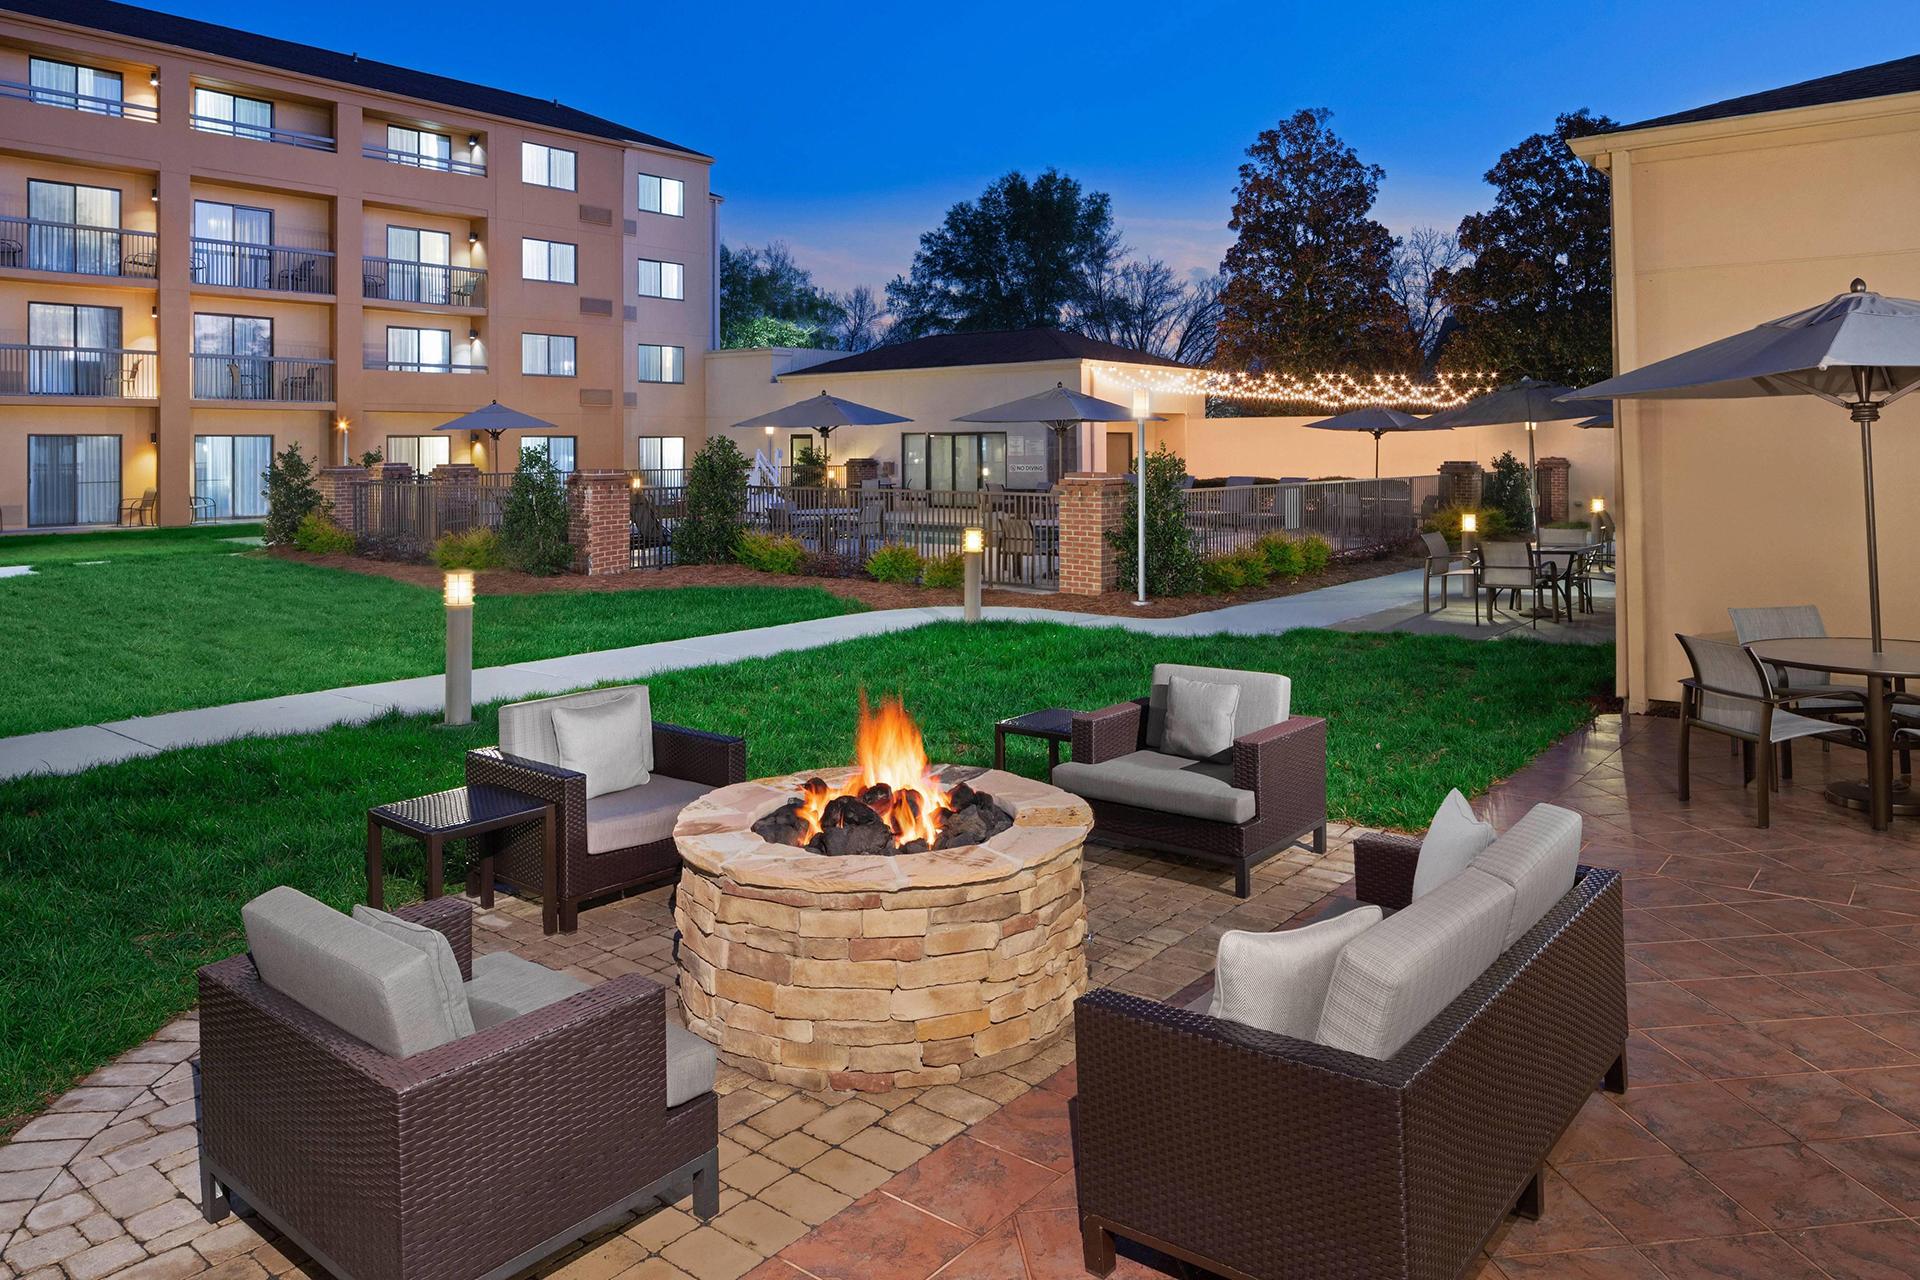 Sonesta Select Raleigh Durham Morrisville Outdoor Patio